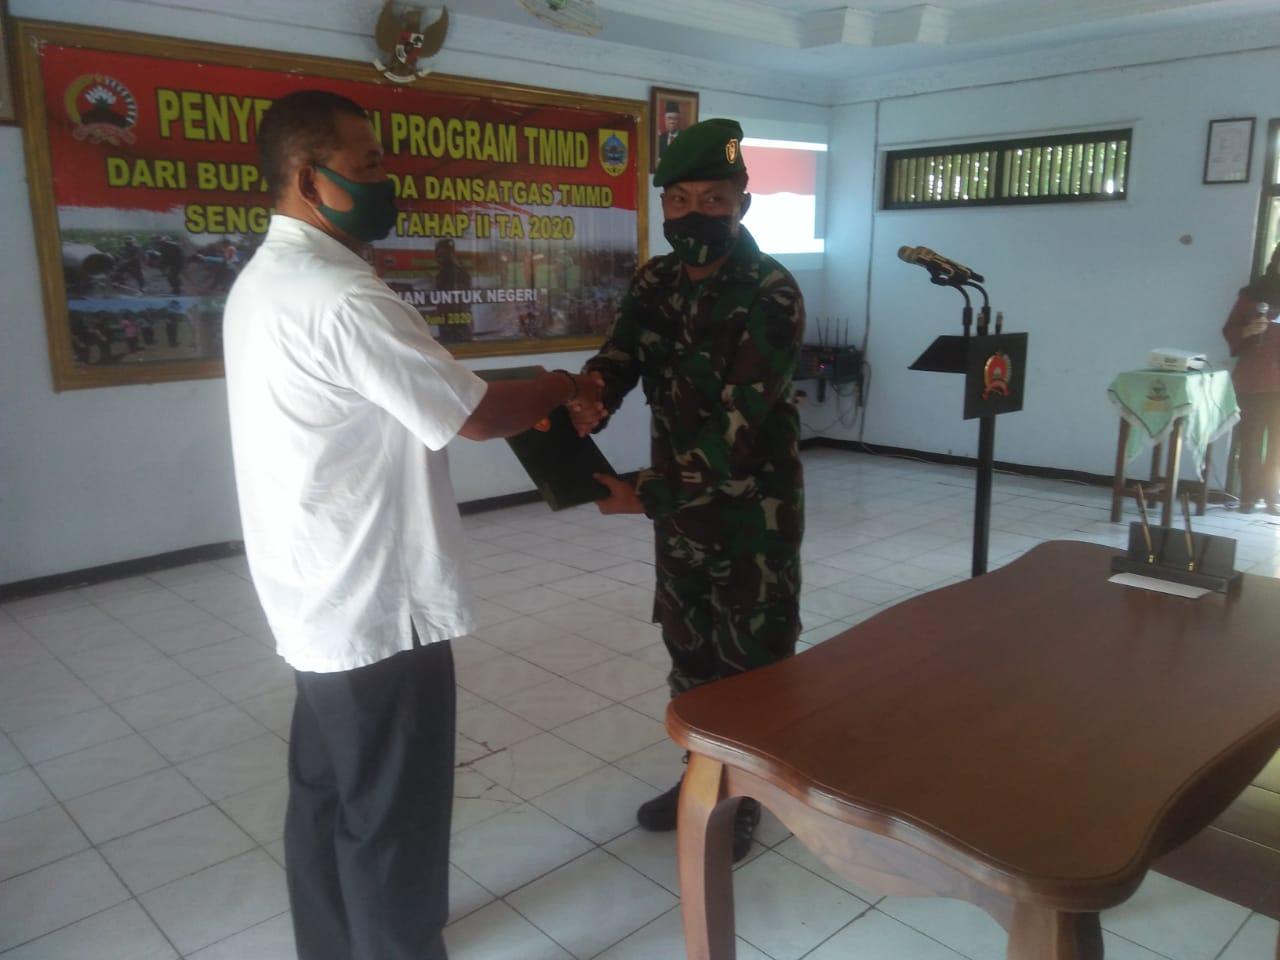 Penyerahan program TMMD Sengkuyung tahap II TA 2020 dari Bupati Pemalang kepada Dandim Selaku Dansatgas.